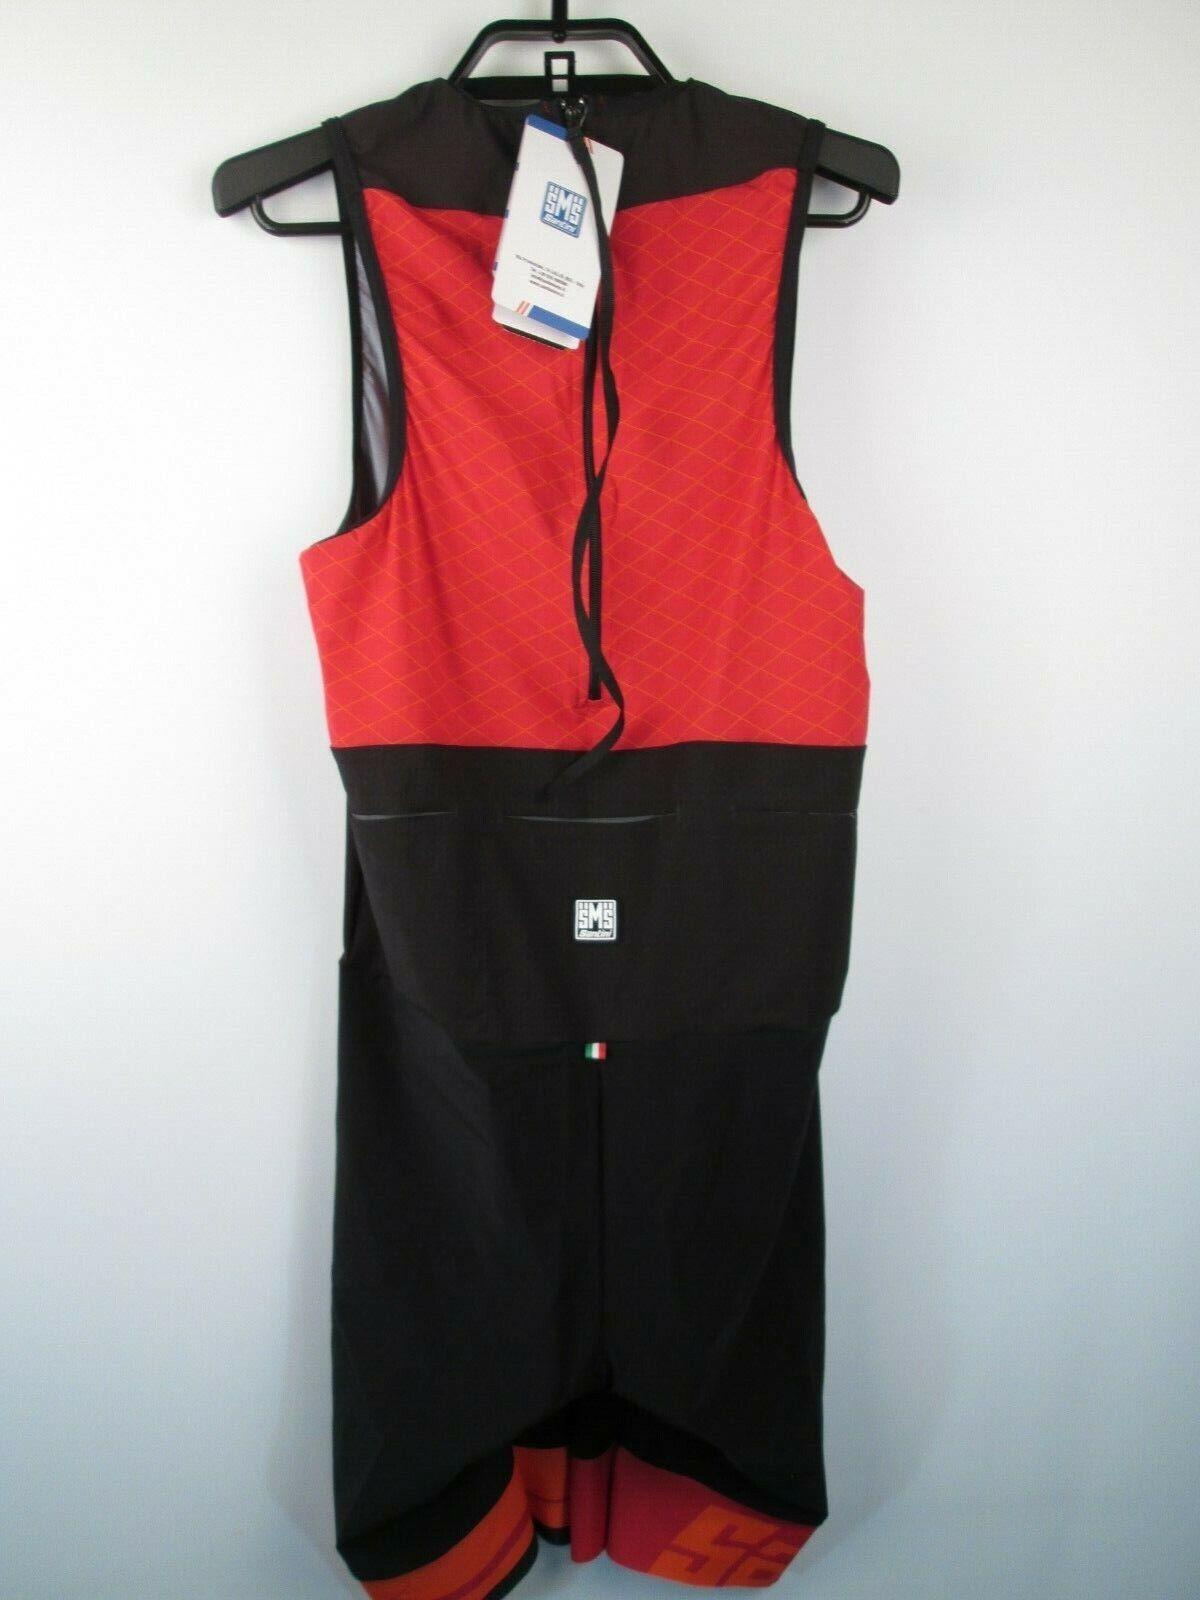 SANTINI Reux Trisuit Skinsuit Sleeveless rot Herren XL NWT Radfahren Suit